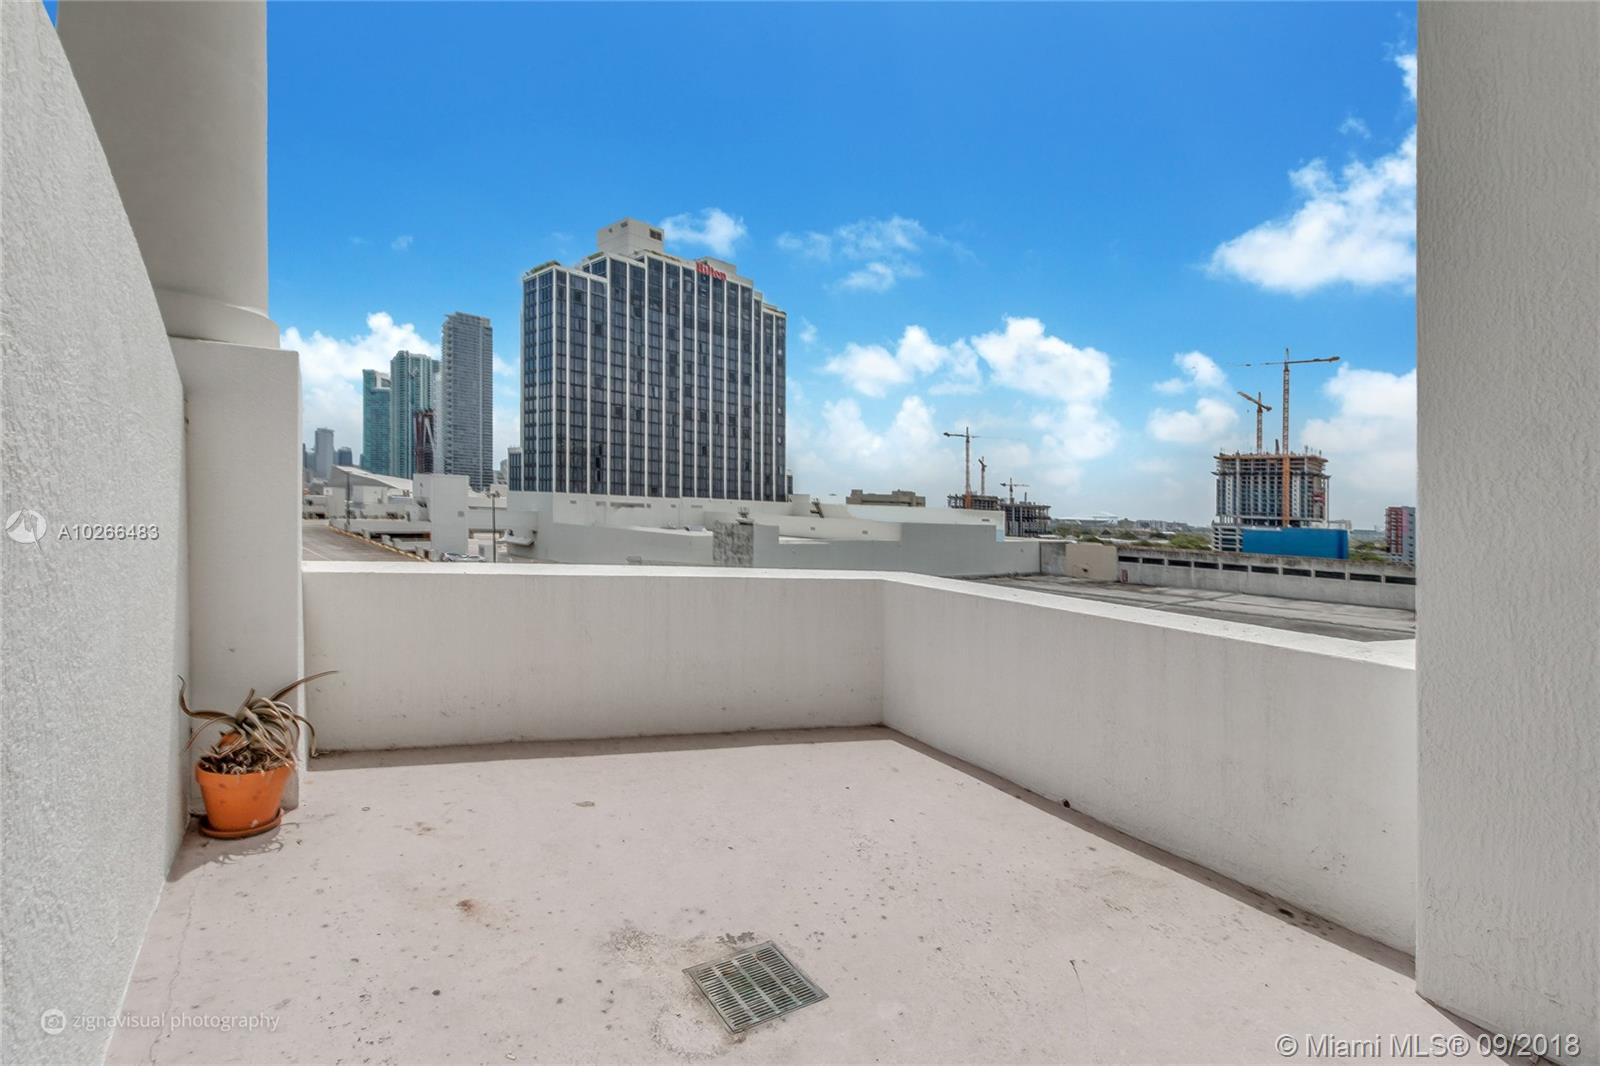 Photo - 1750 N Bayshore Dr # 1116, Miami FL 33132